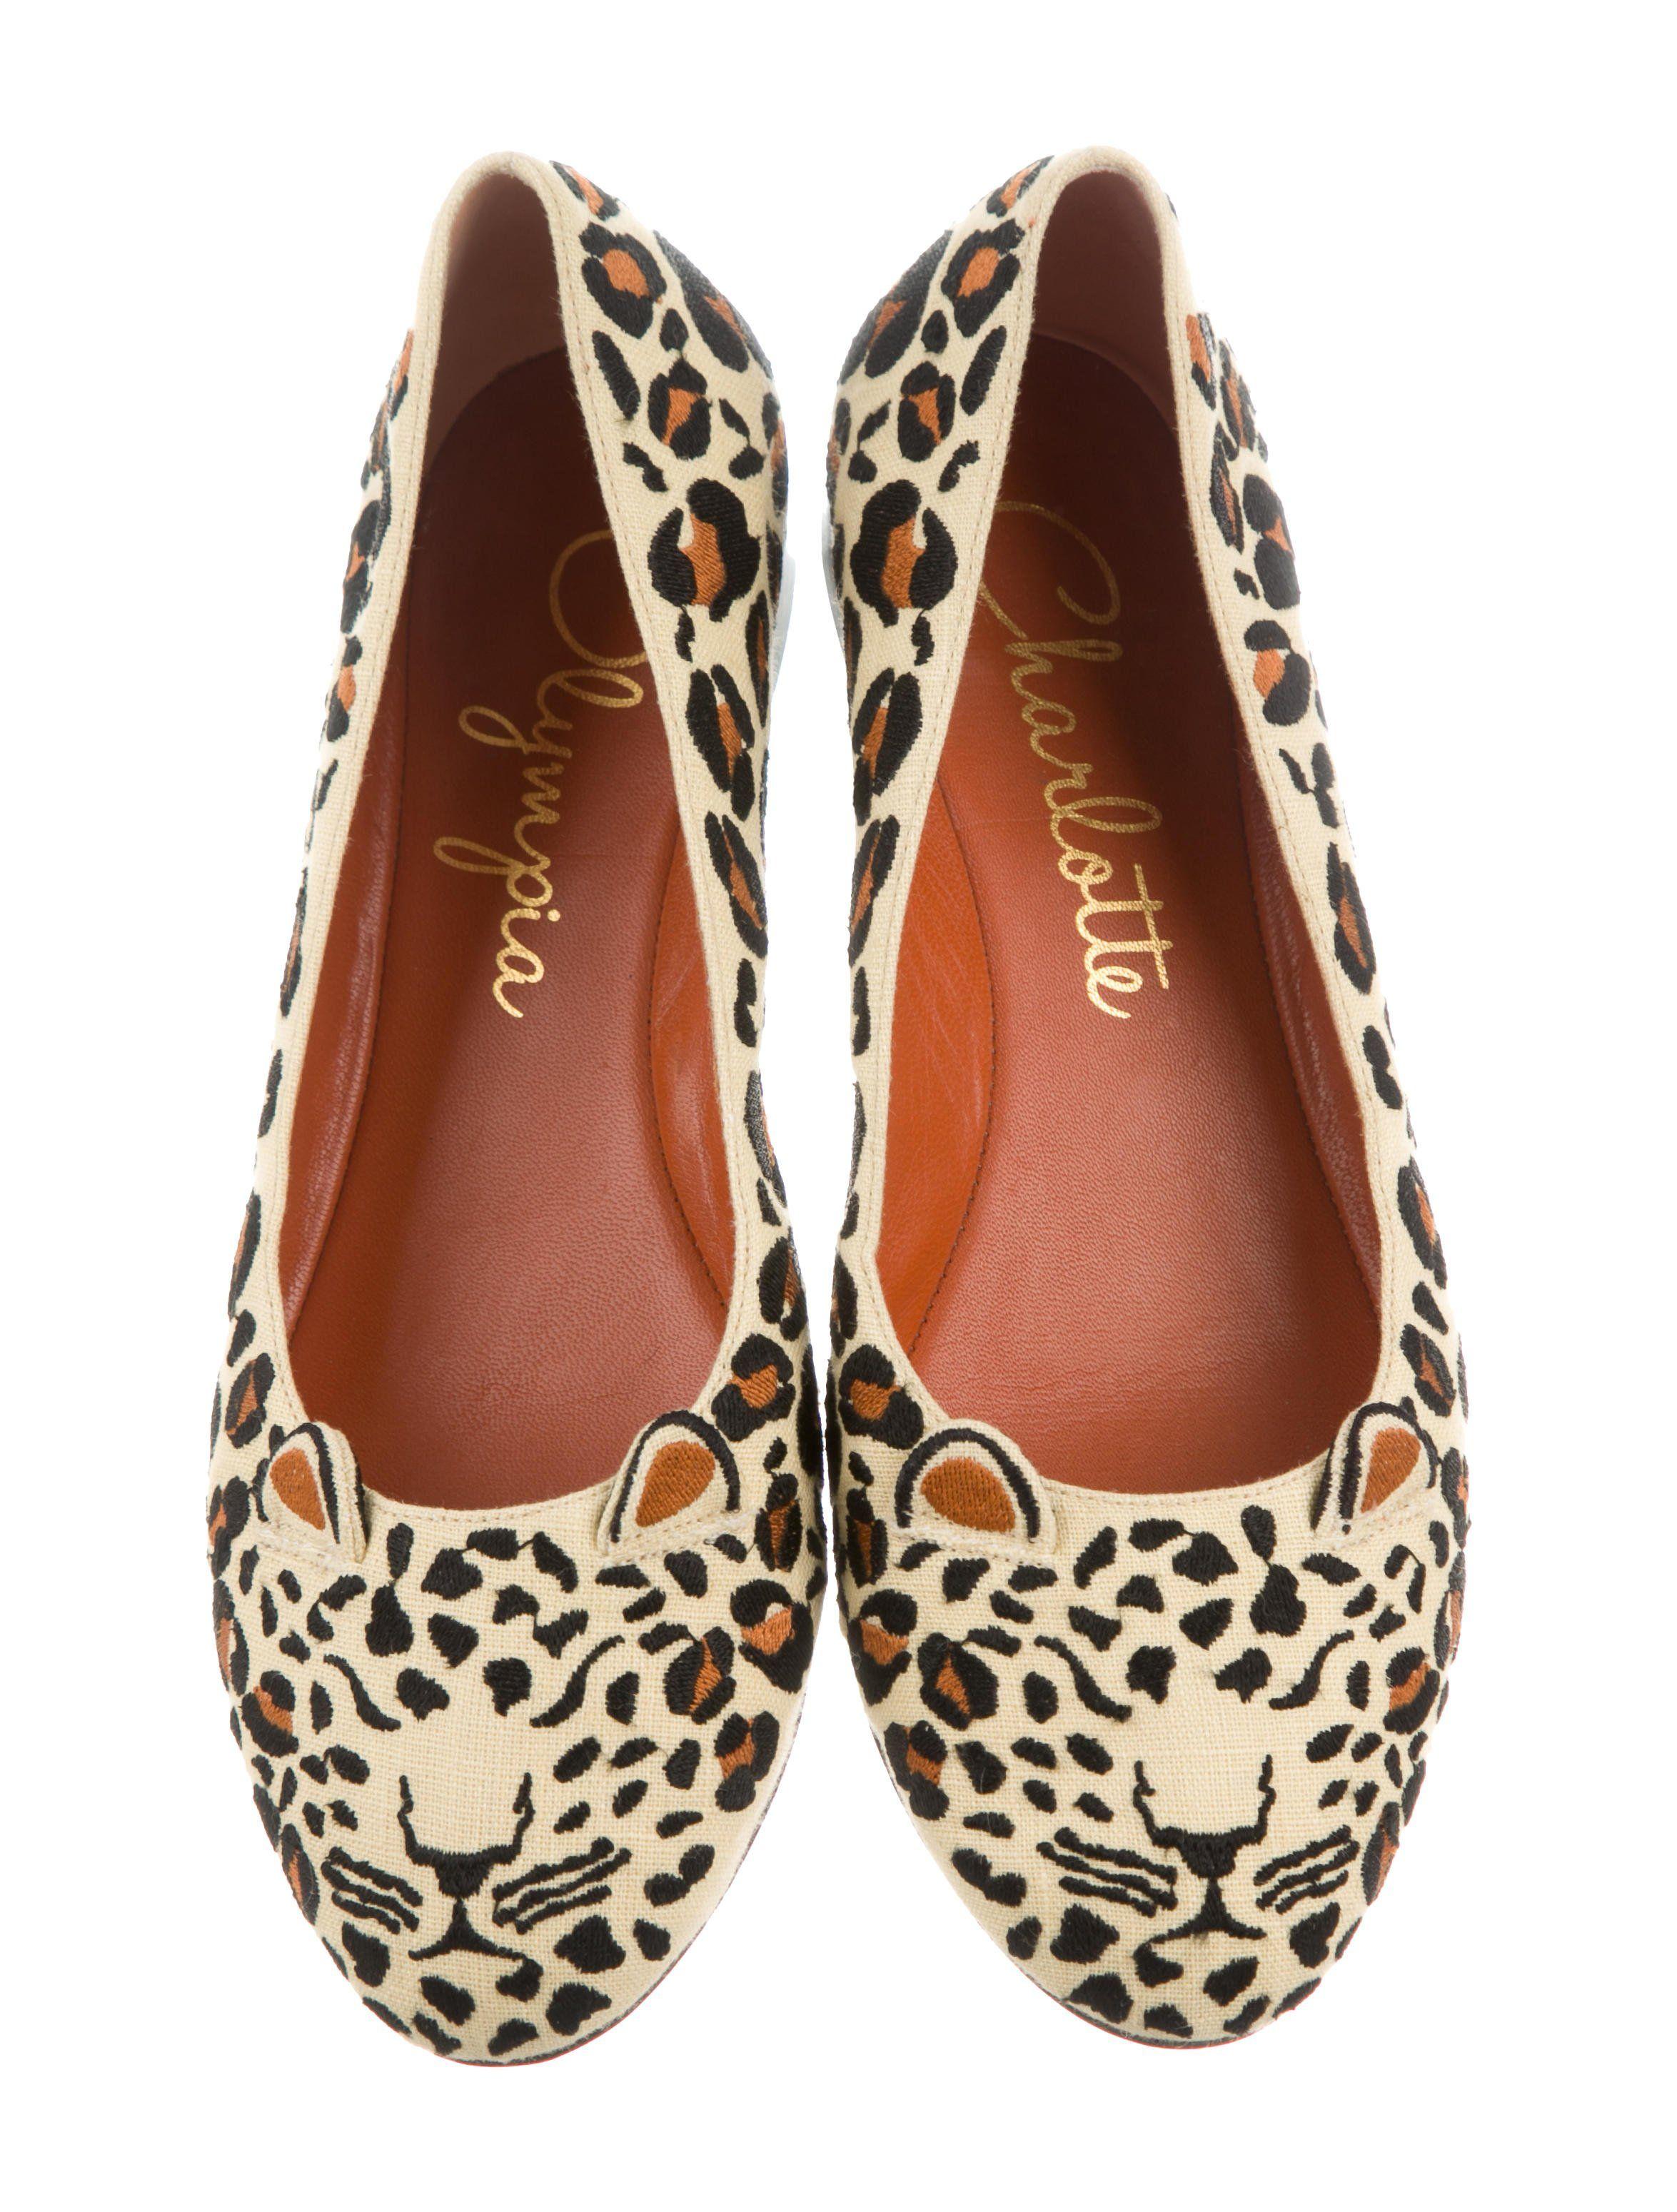 charlotte olympia leopard flats